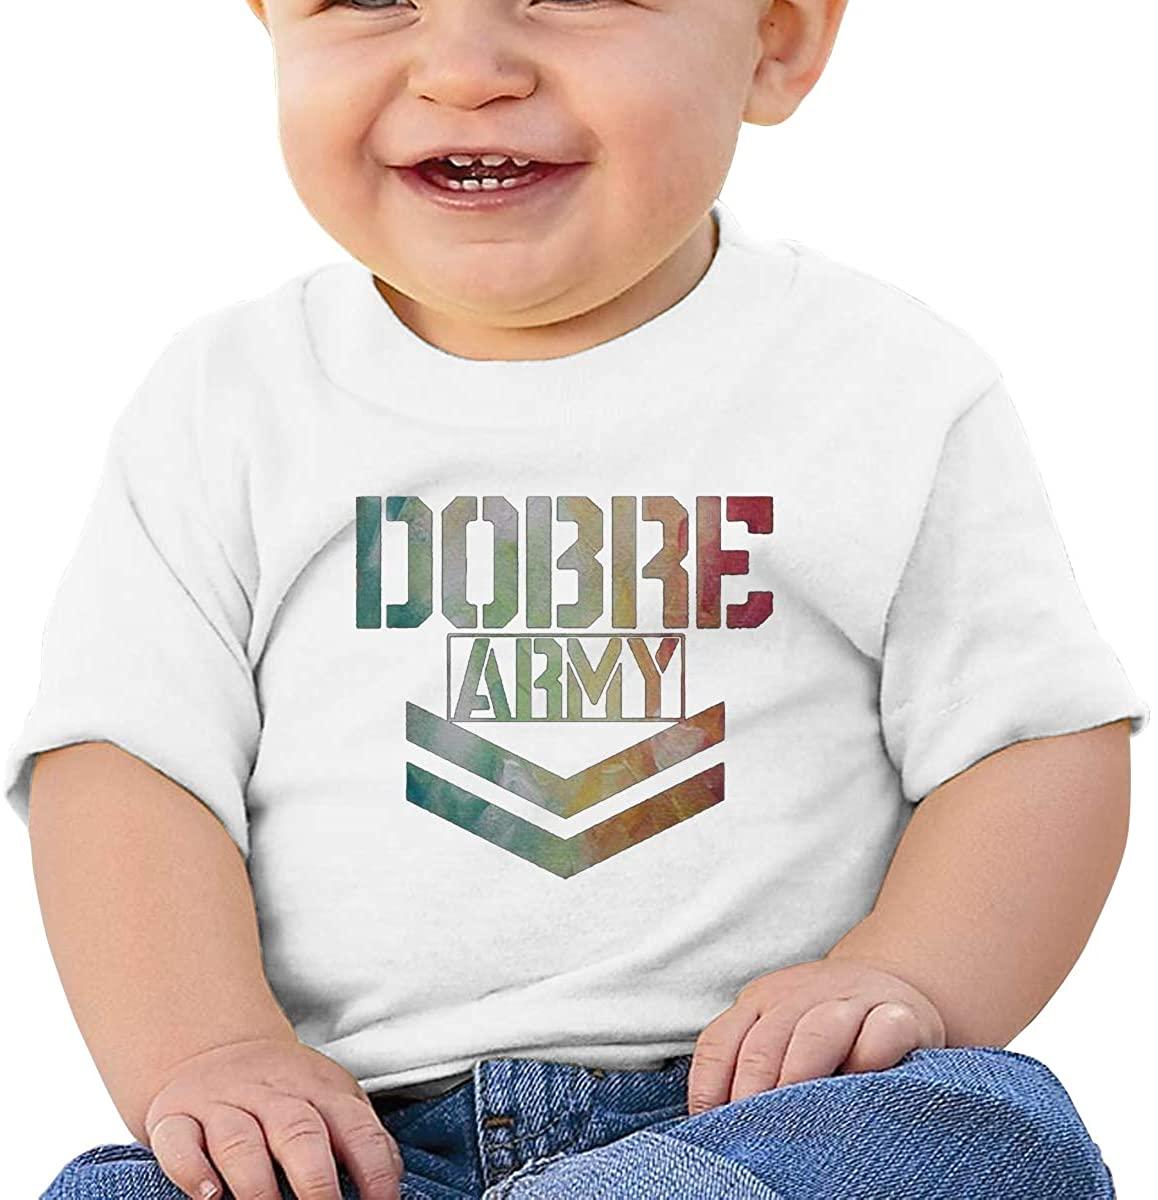 6-24 Months Boy and Girl Baby Short Sleeve T-Shirt Lucas Dobre Original Minimalist Style White